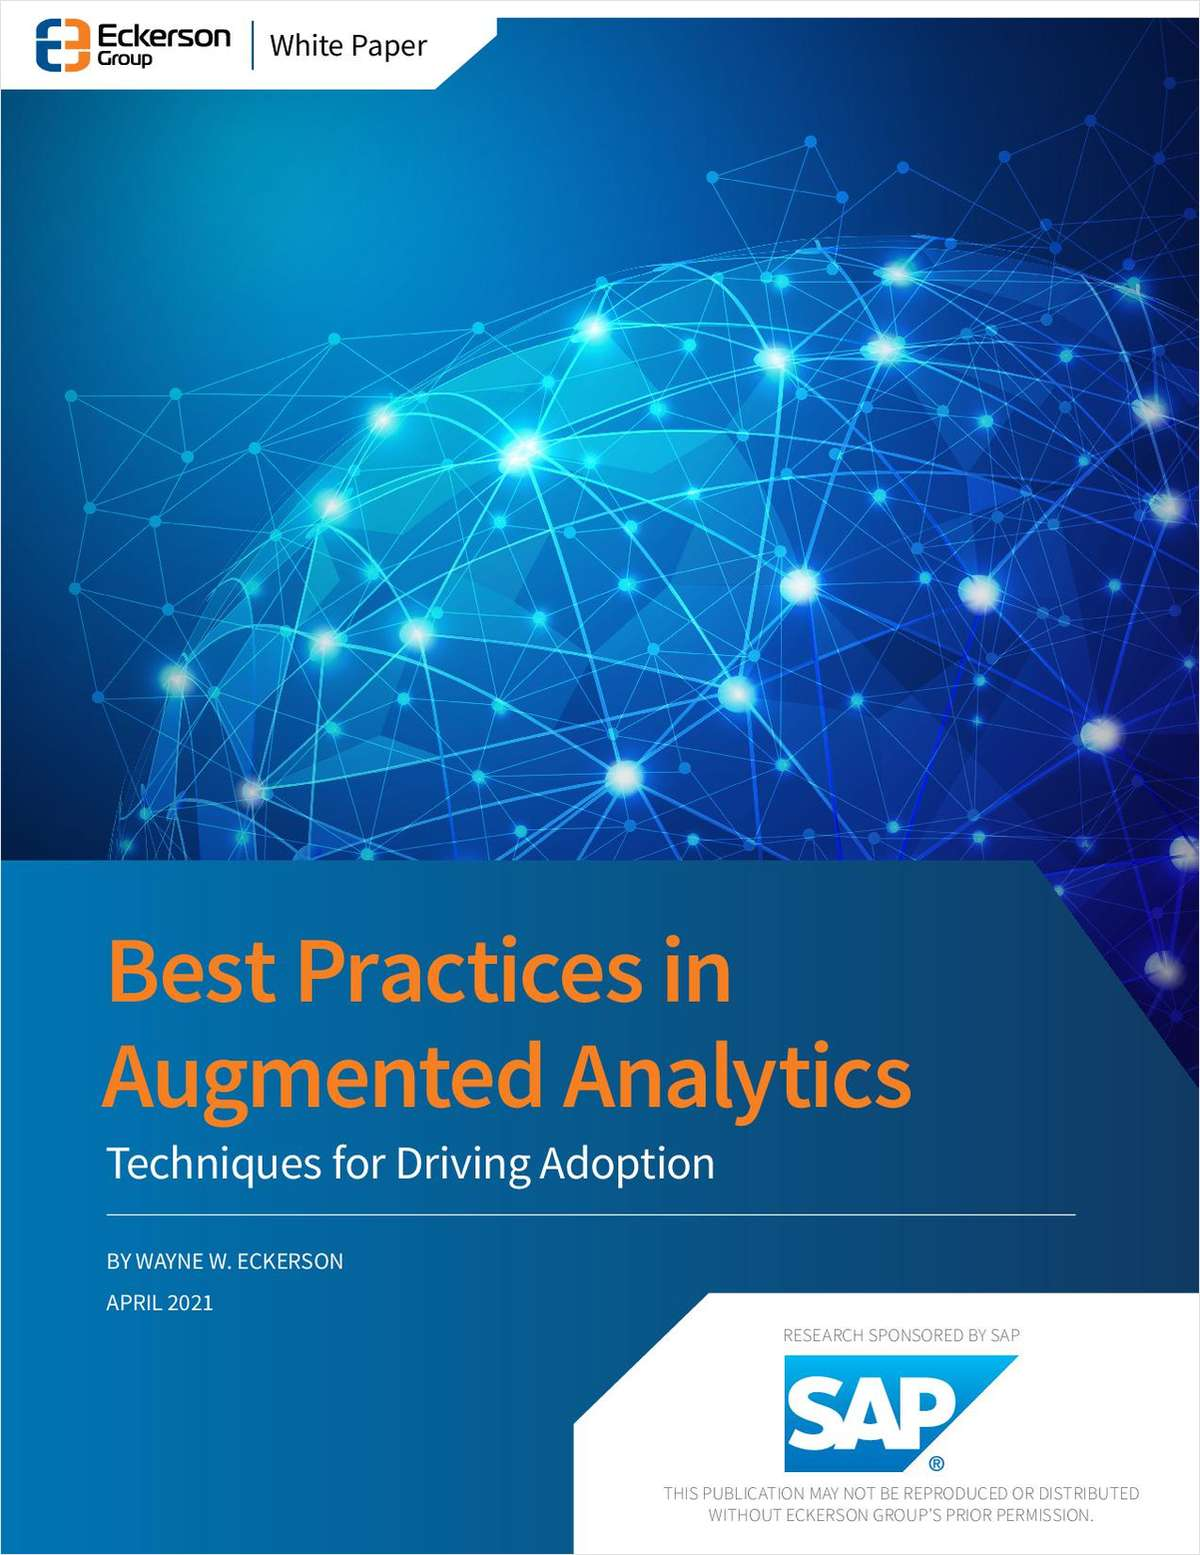 Best Practices in Augmented Analytics